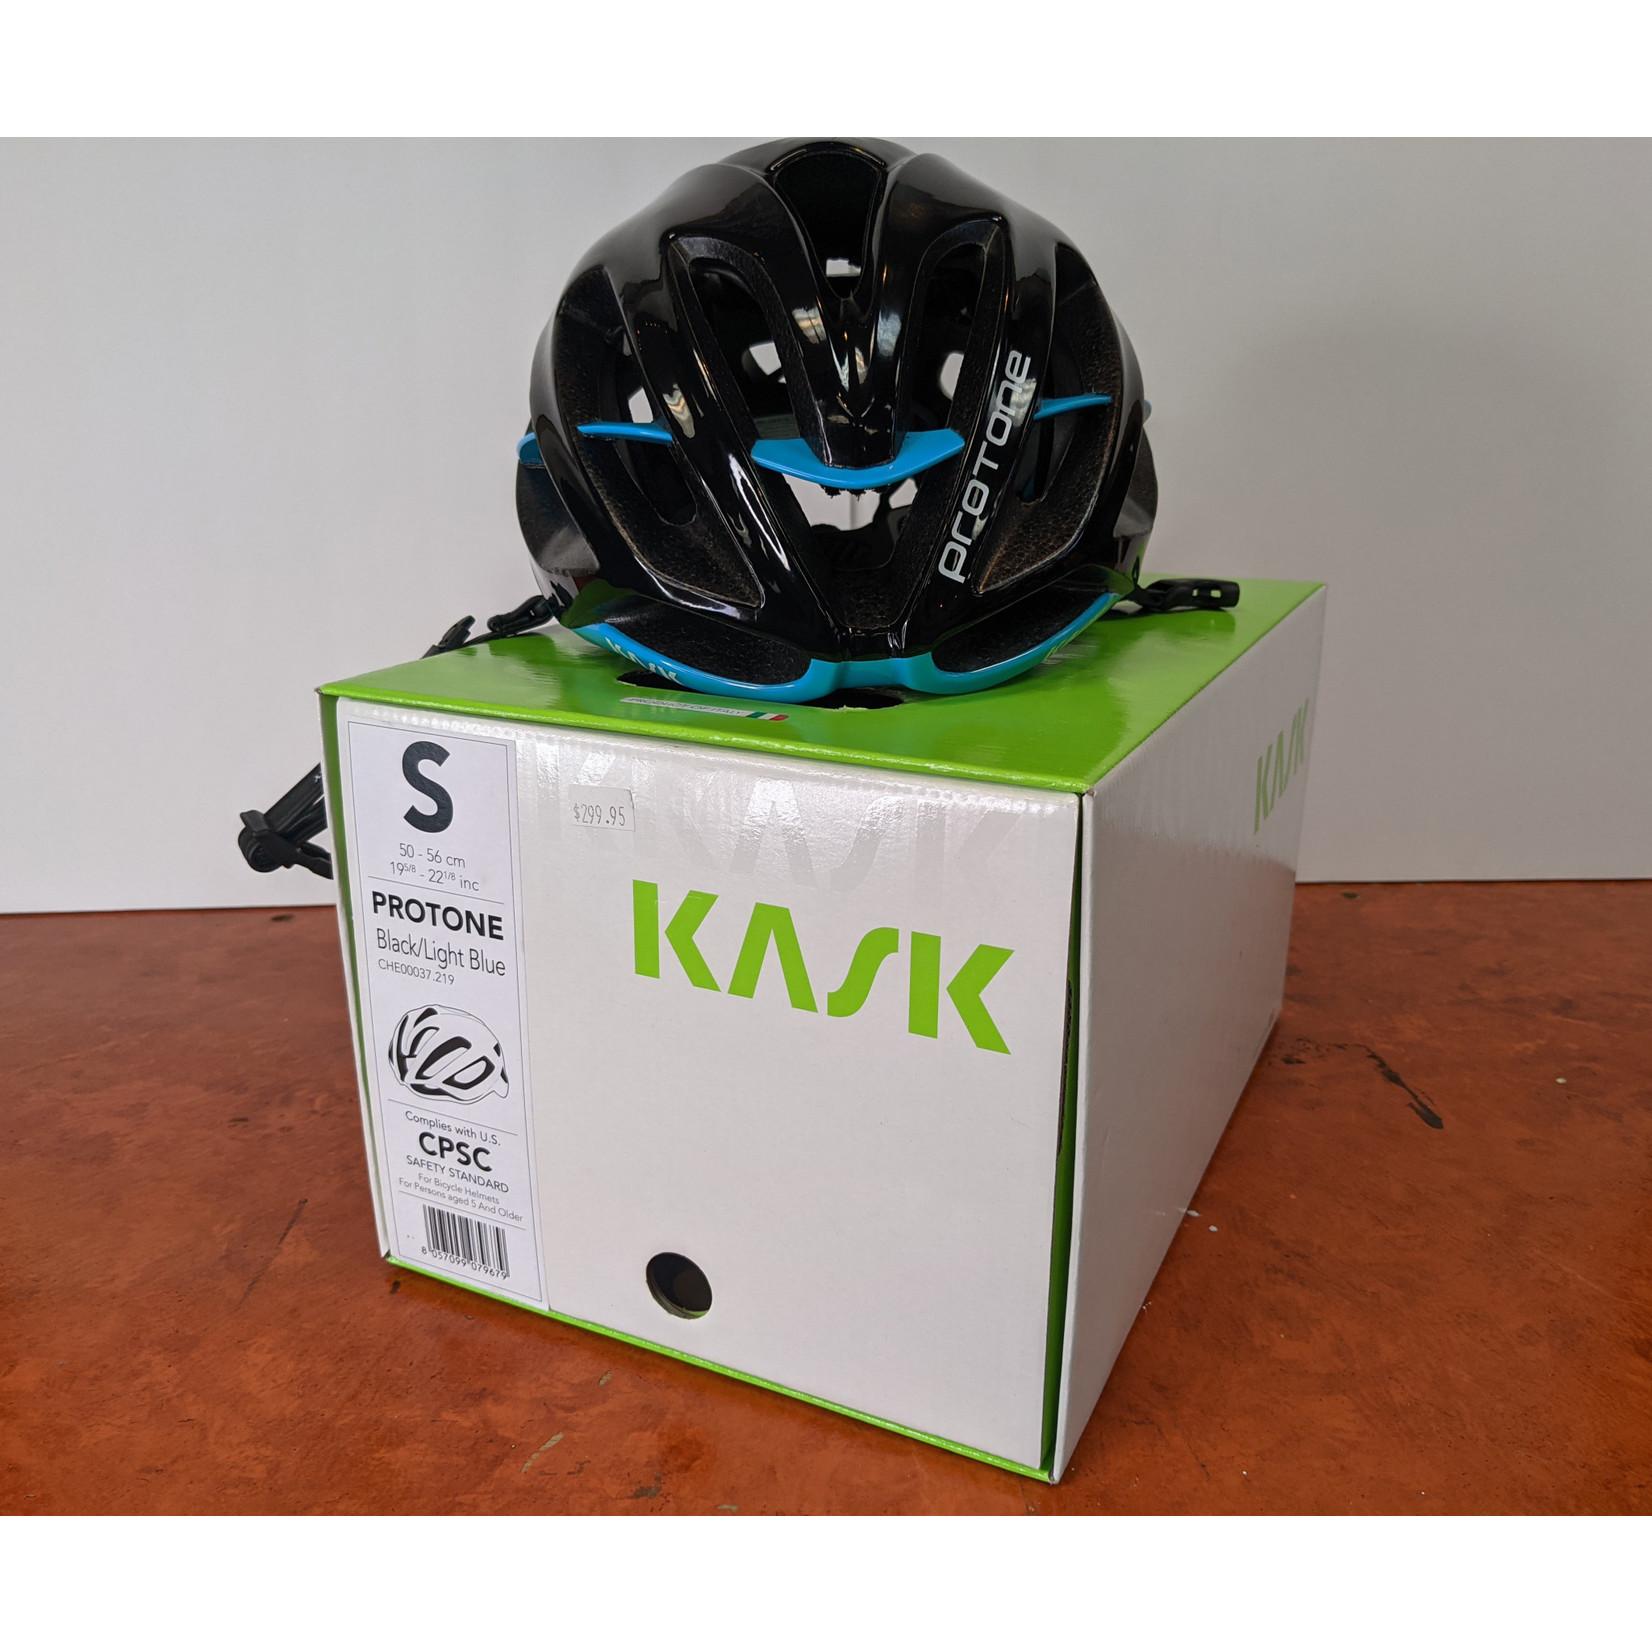 Kask Kask Team Protone light blue black S